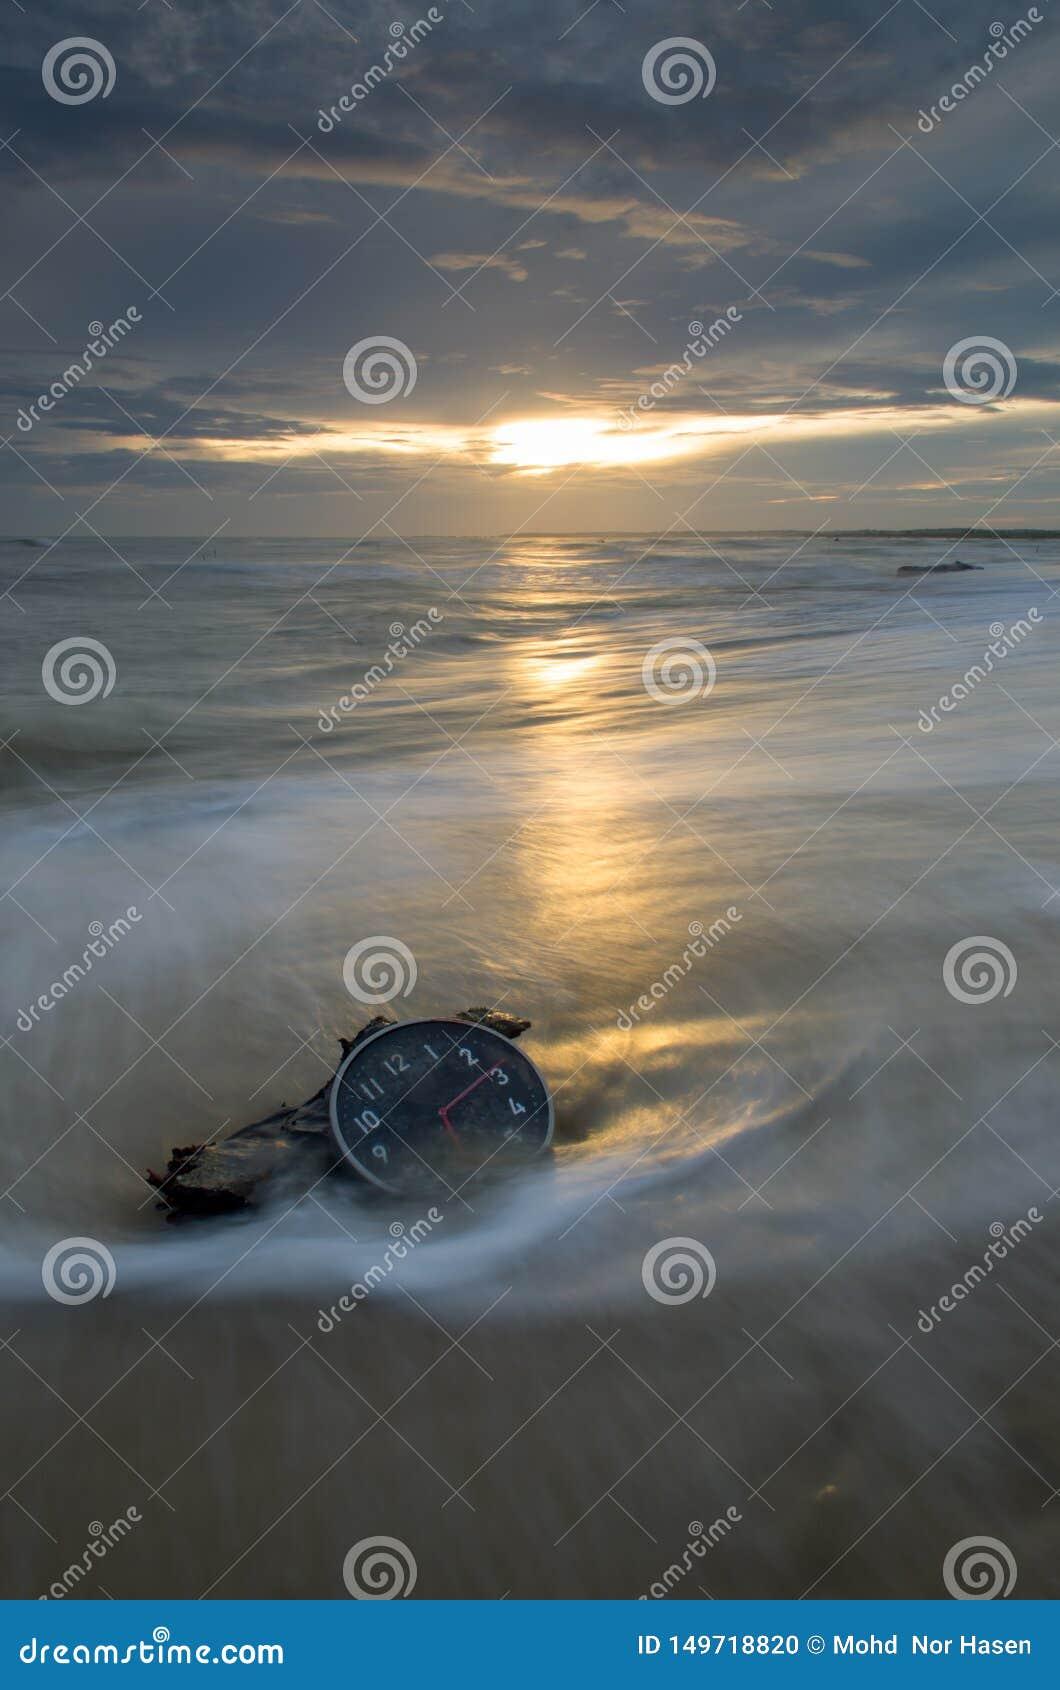 Concept Alarm Clock On Beach Of Island Stock Photo Image